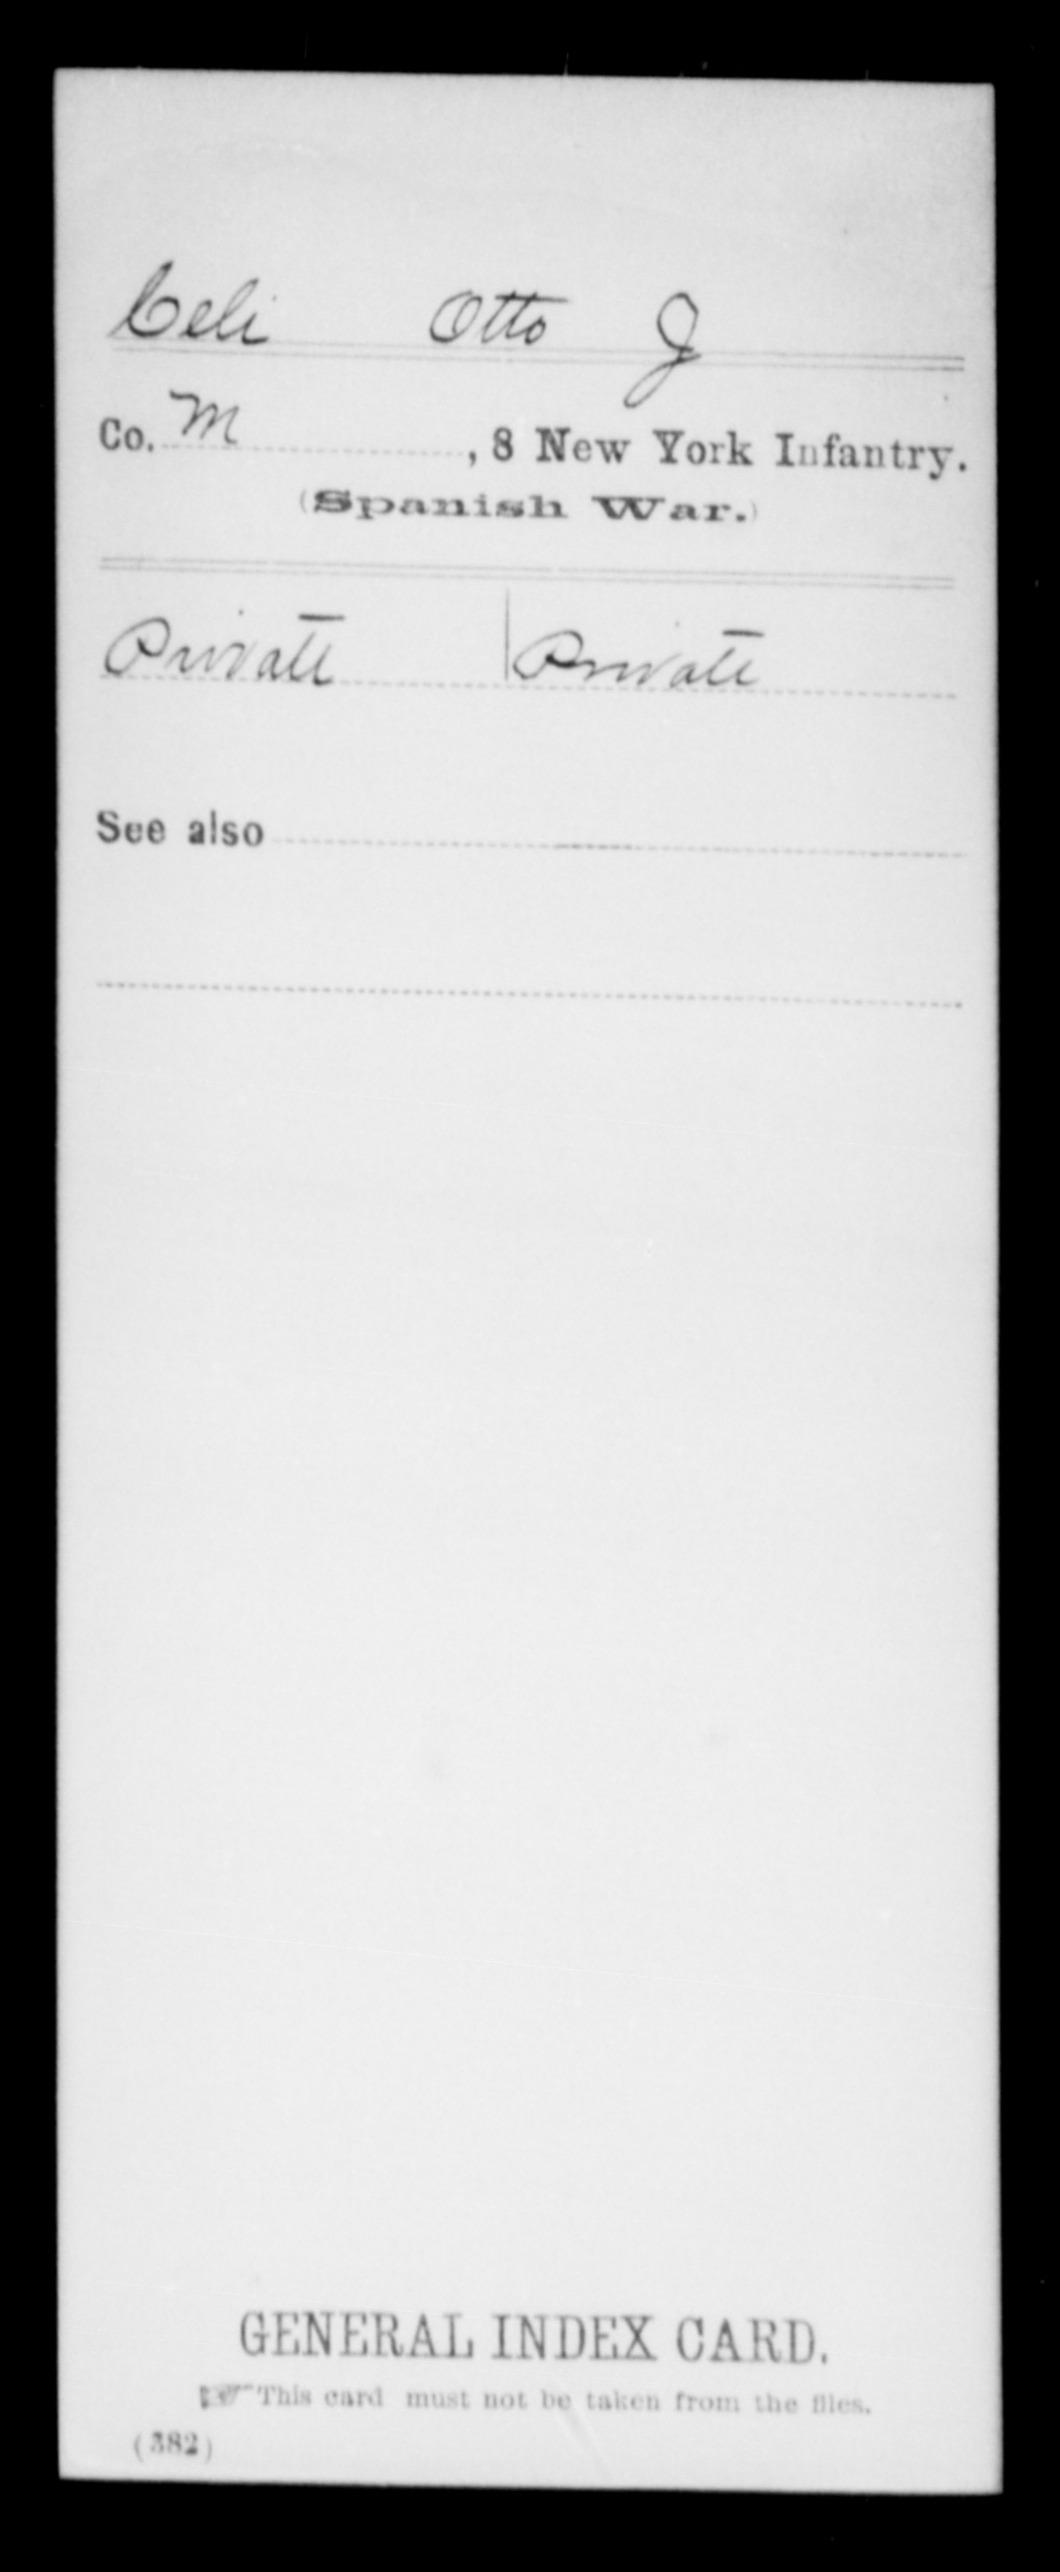 Celi, Otto J - State: New York - Regiment: 8 New York Infantry, Company M